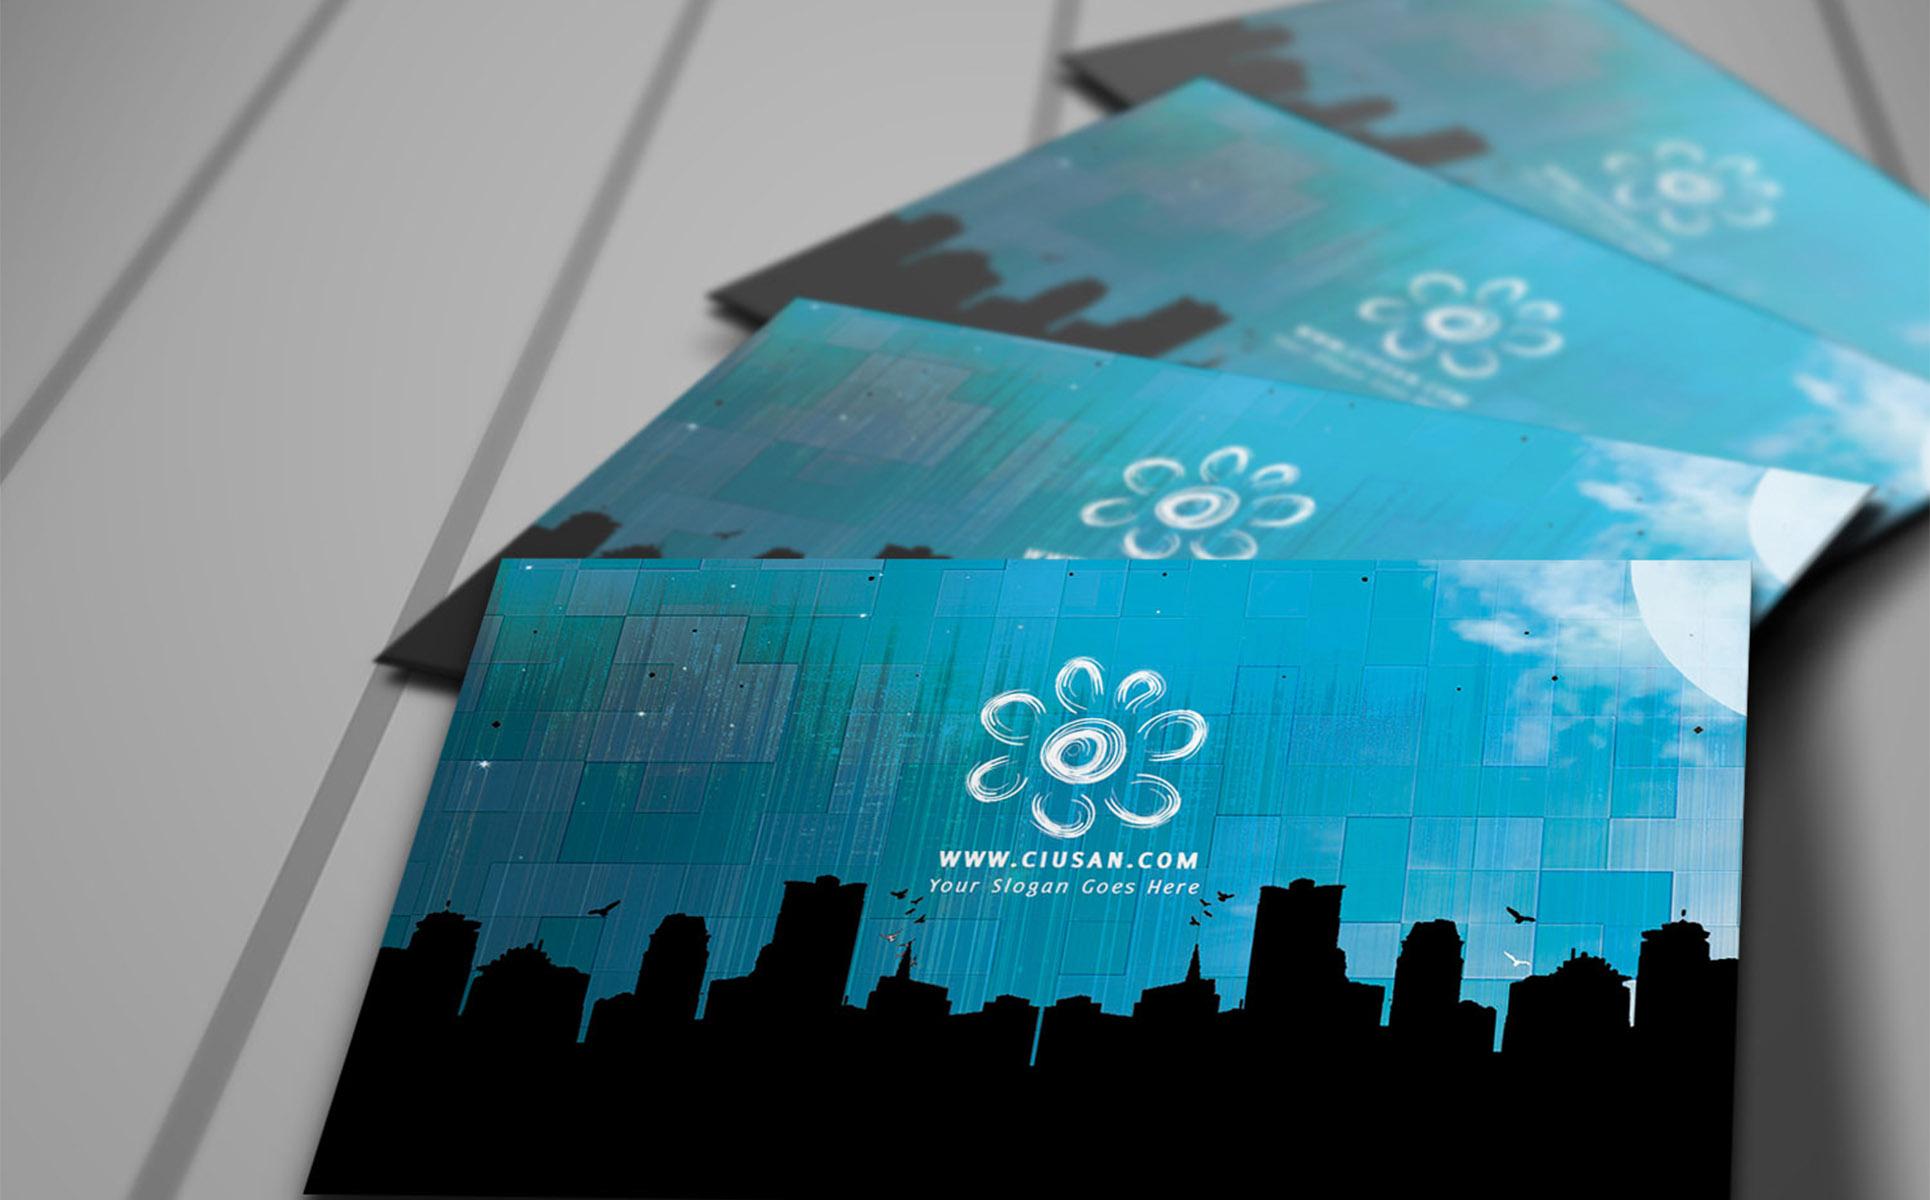 Creative blue business card psd template 65117 creative blue business card psd template accmission Gallery